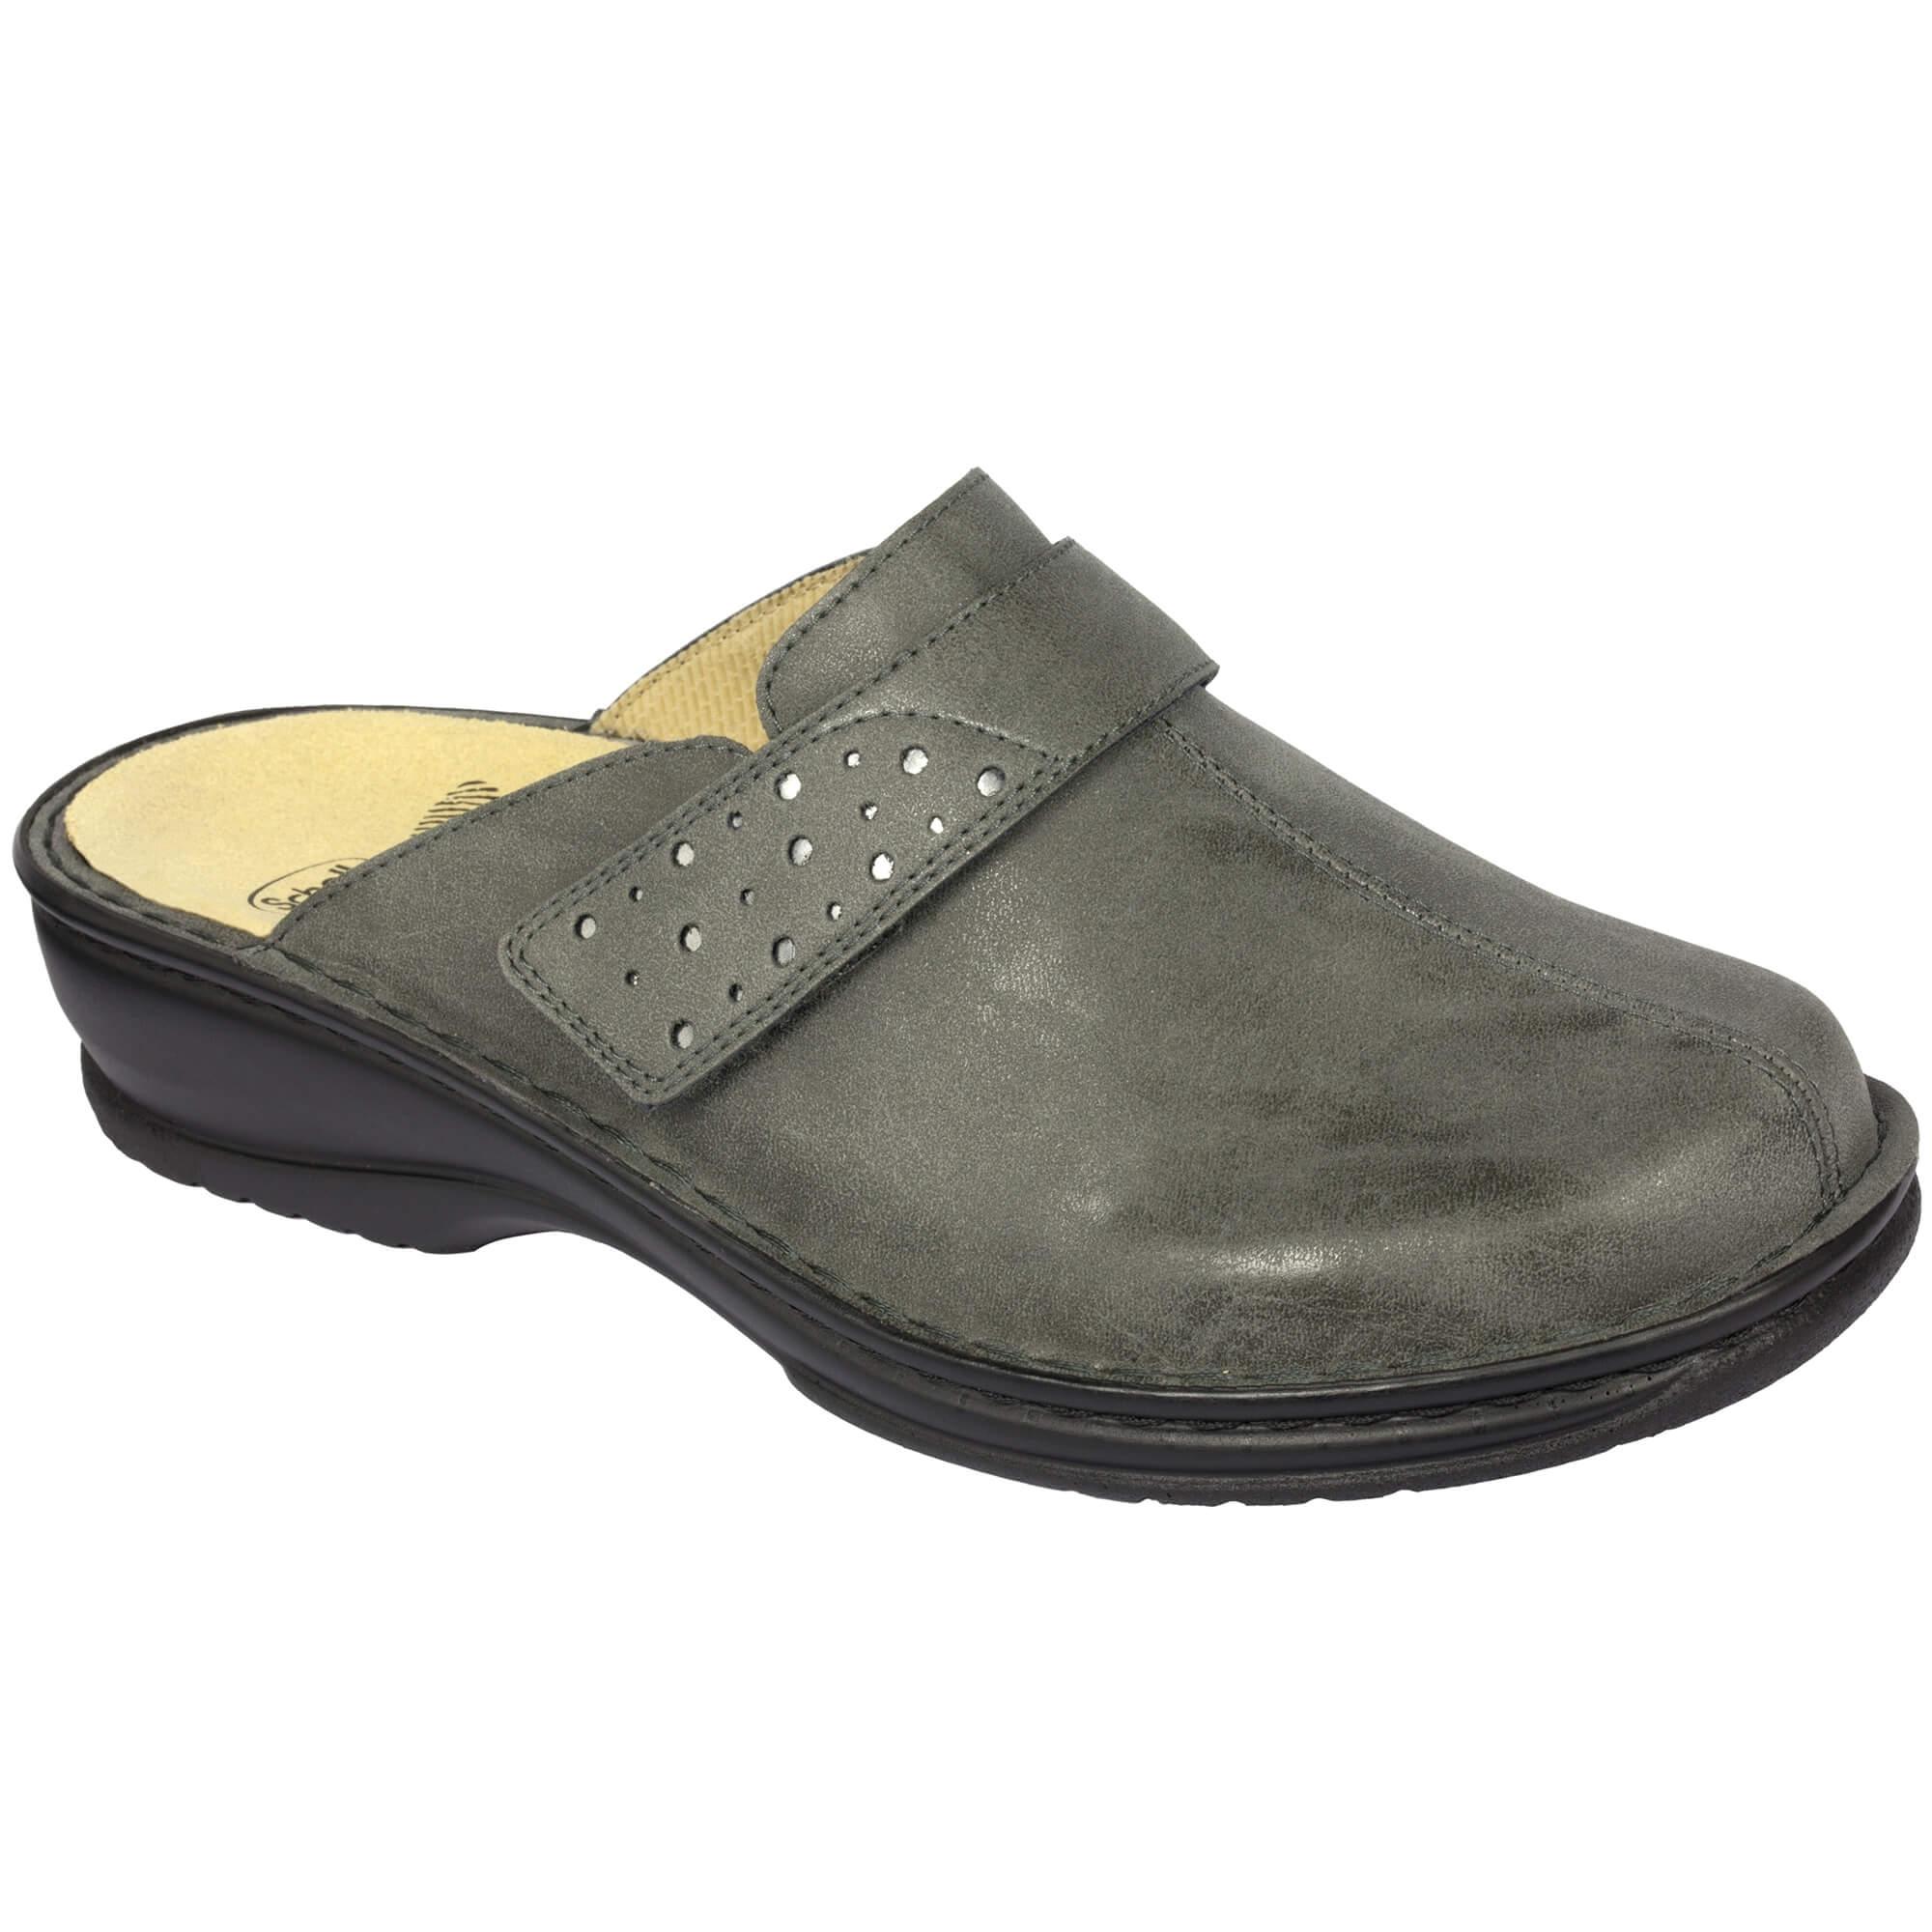 Dr Scholl Shoes Genziana ΓκριΓυναικείεςΑνατομικέςΠαντόφλες, Χαρίζουν Σωστή Στ φαρμακείο   ανατομικά παπούτσια   γυναικεία ανατομικά παπούτσια